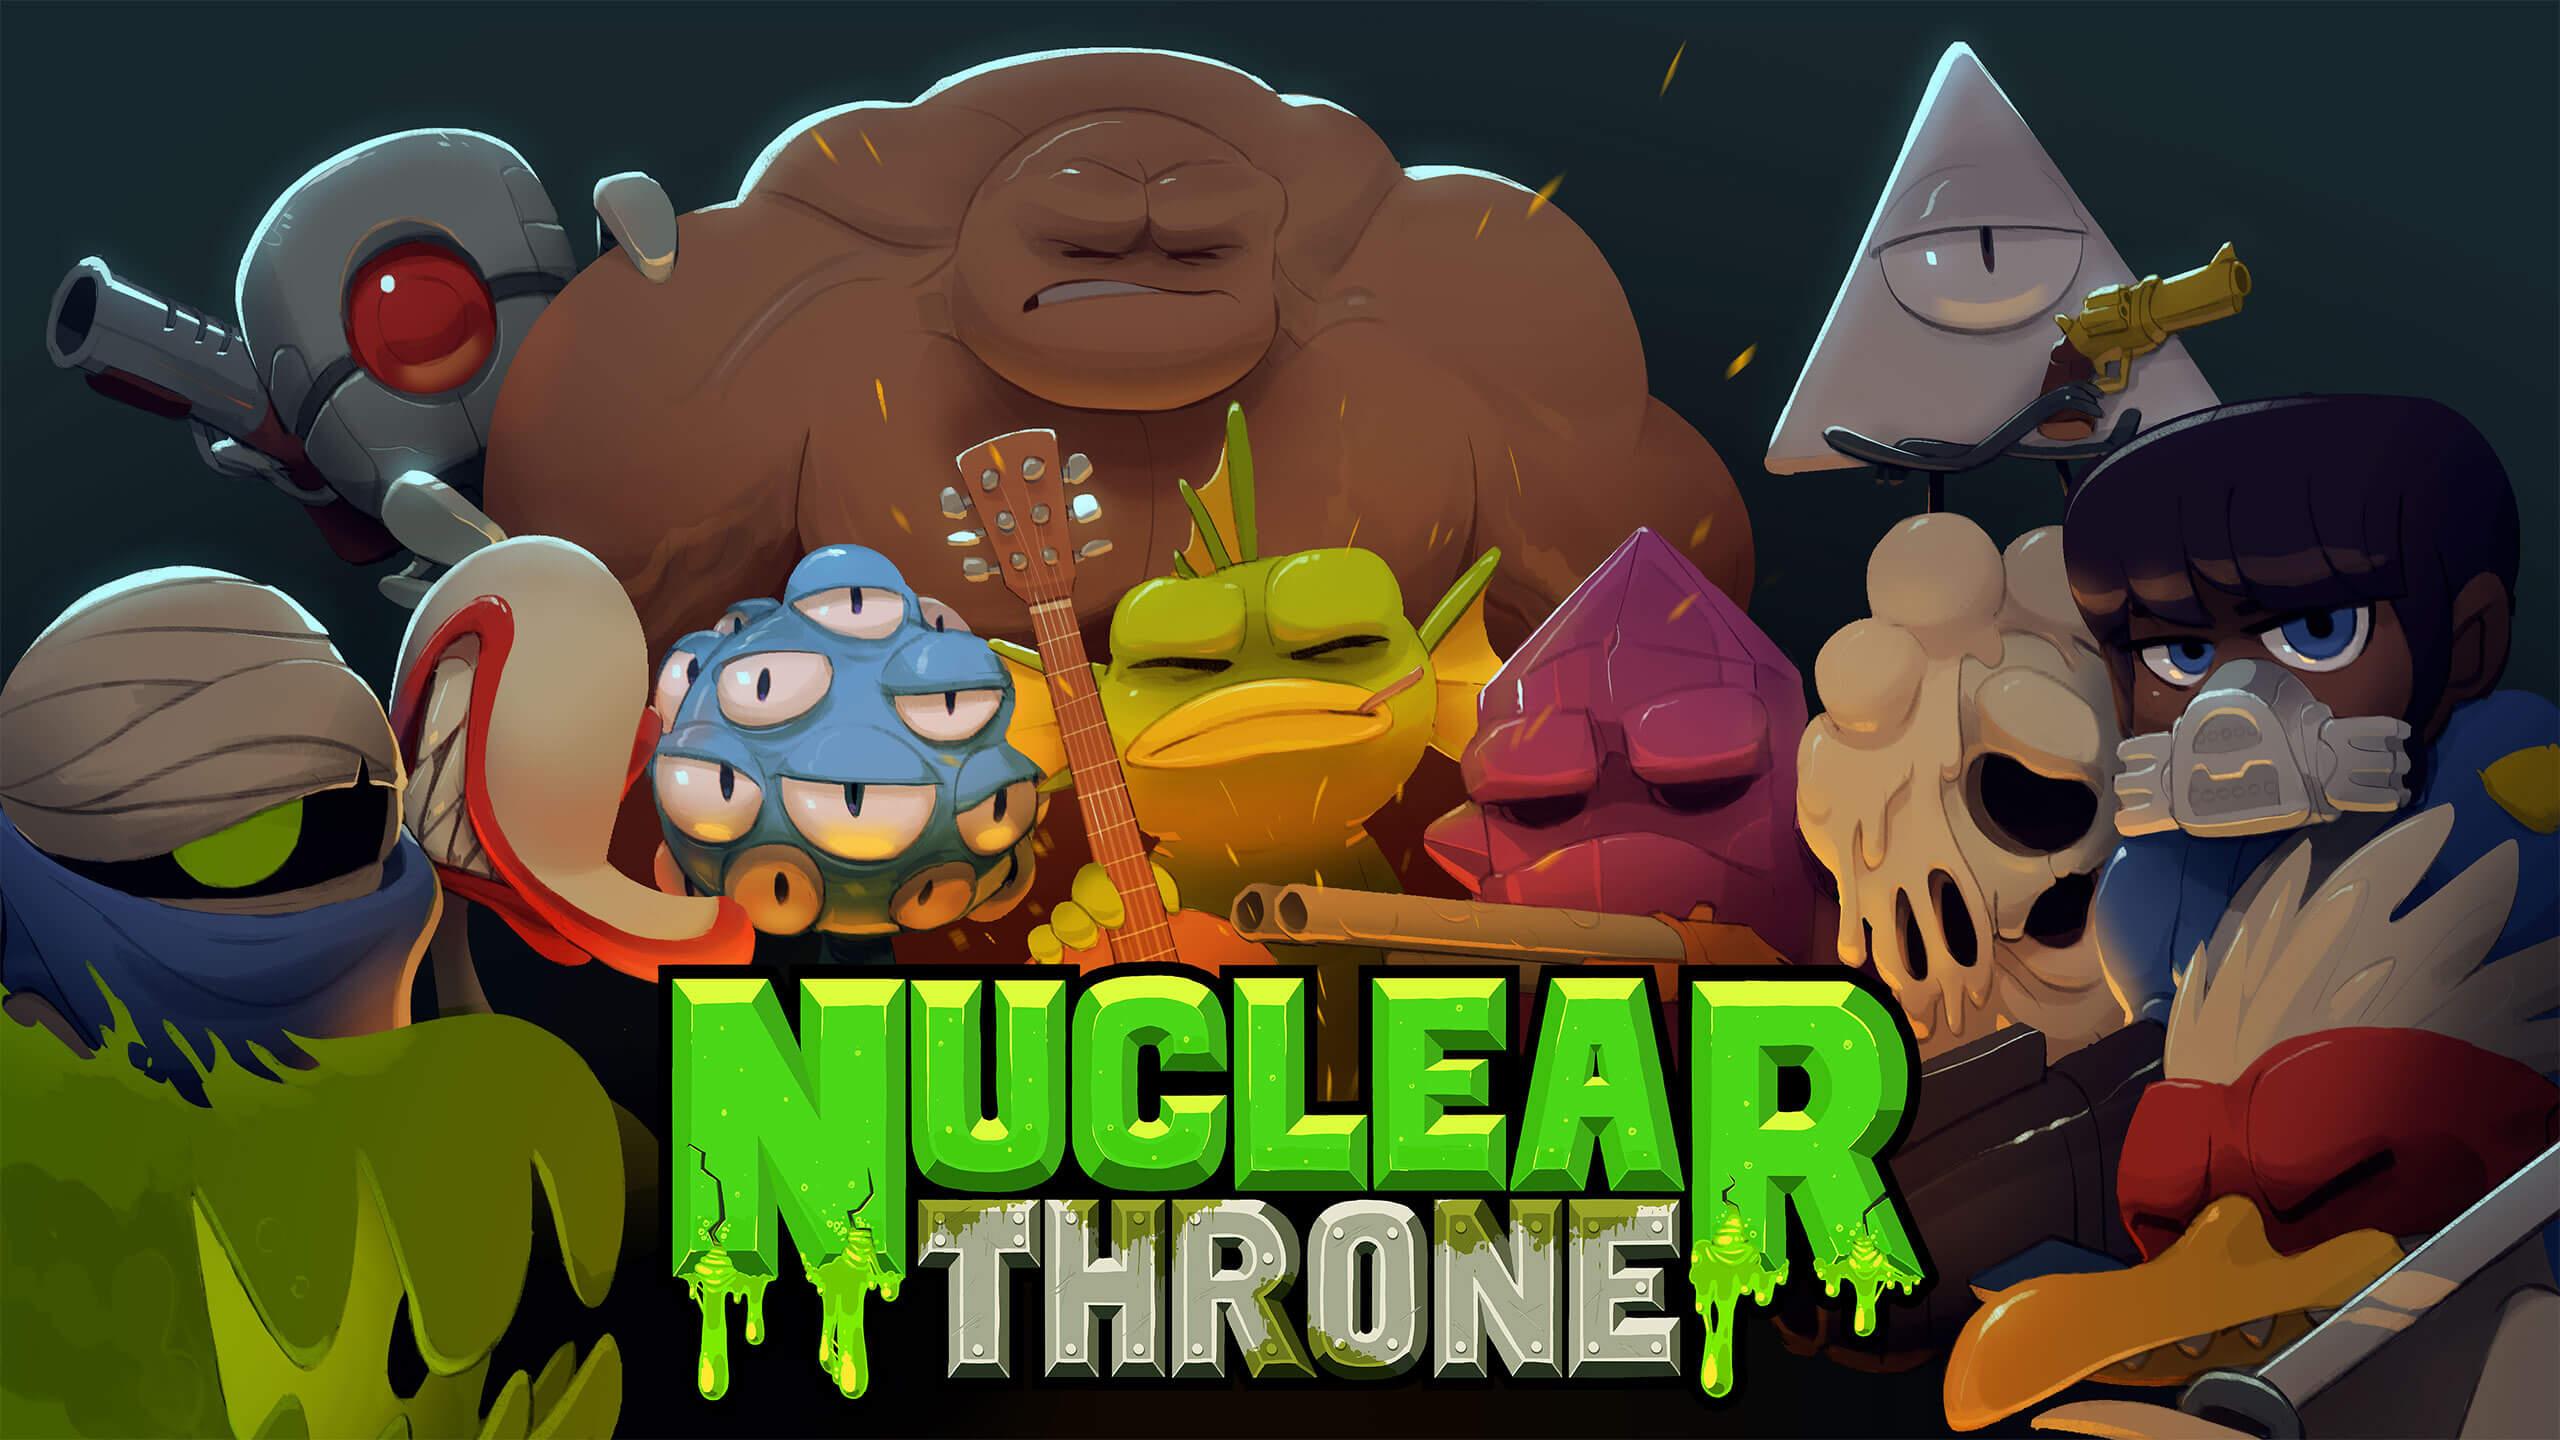 Nuclear Throne и другие инди-игры получили 90% скидки в Steam